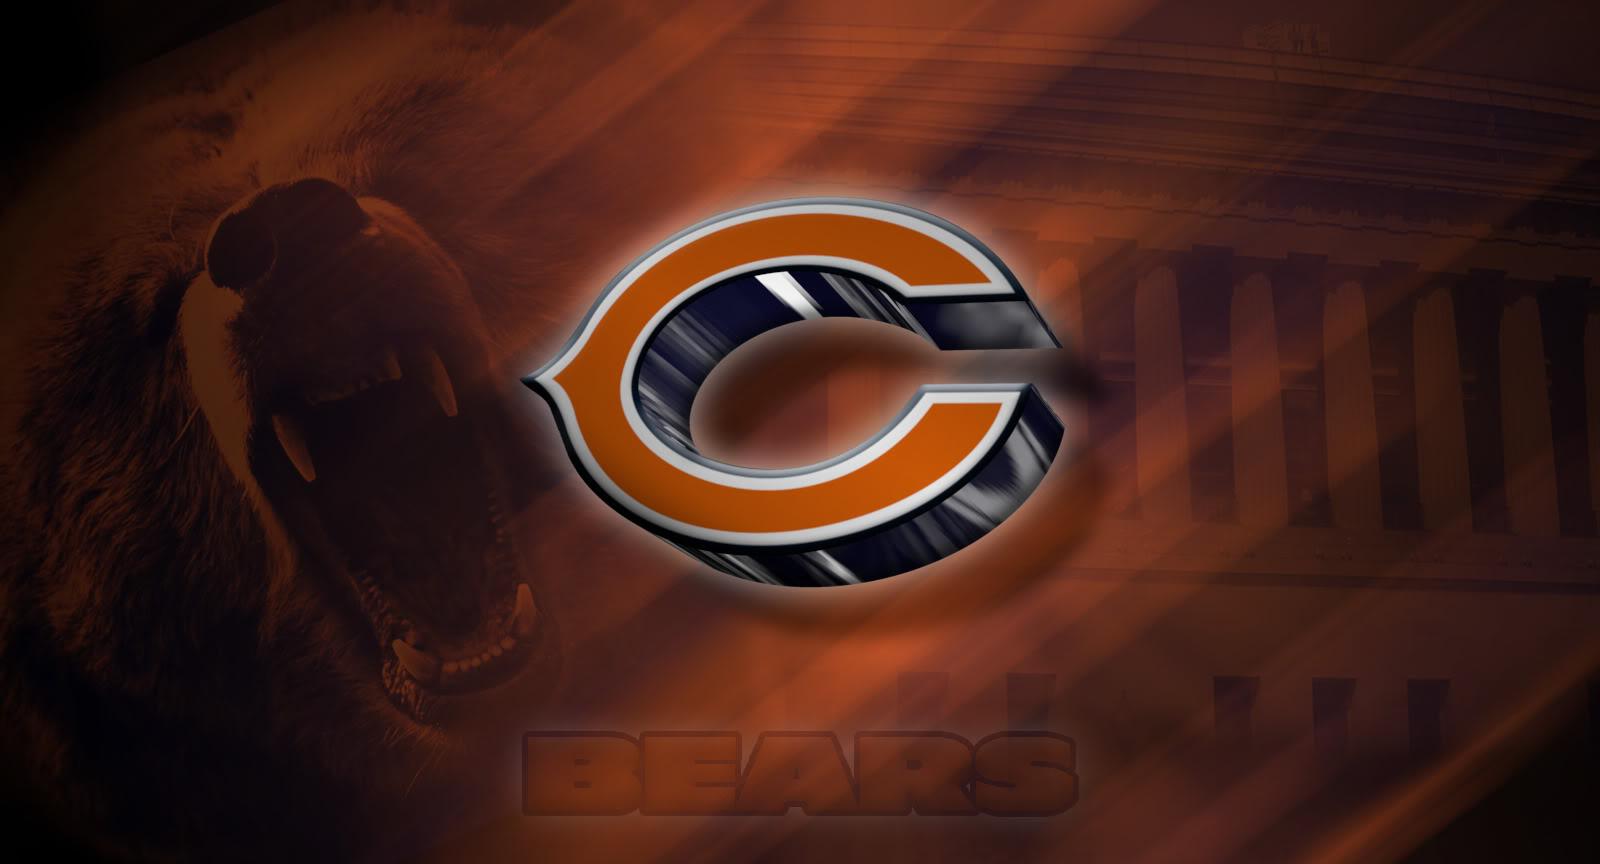 Chicago Bears Soldier Field Wallpaper 1600x864 Full HD Wallpapers 1600x864